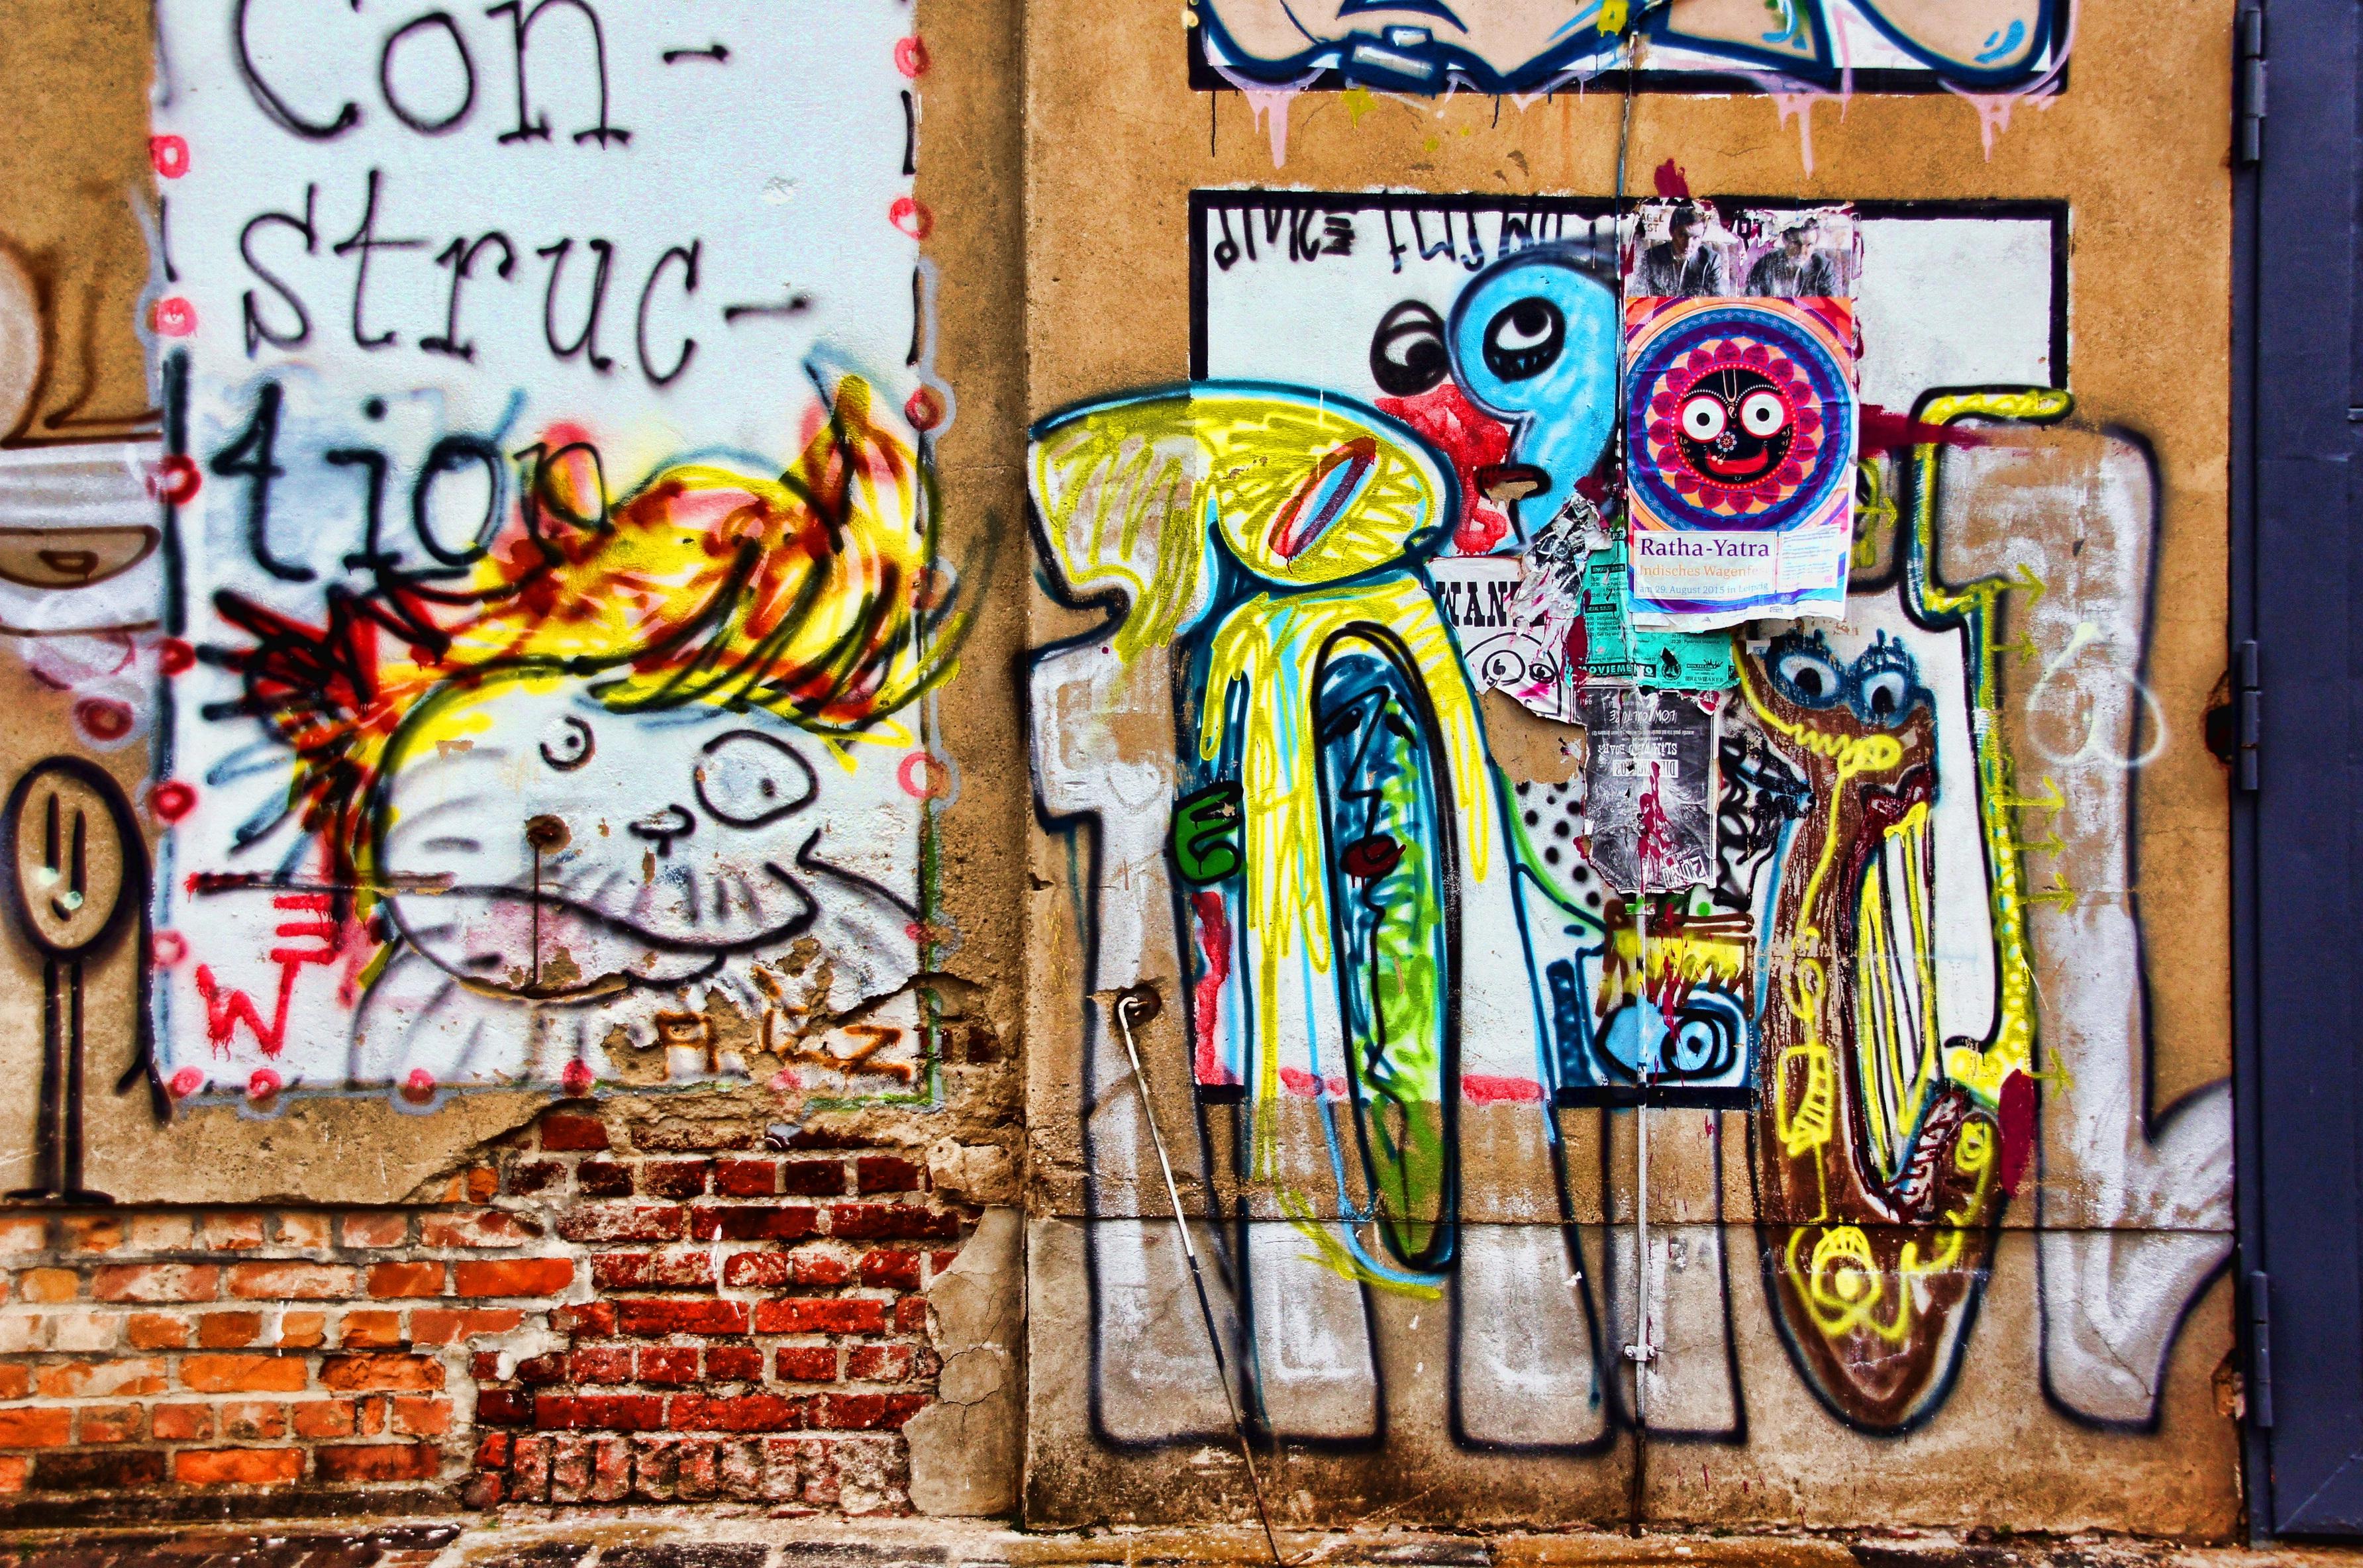 Graffiti wall painting - Street Window Wall Spray Graffiti Painting Street Art Art Mural Leipzig Wall Painting Sprayer Hauswand Plagwitz